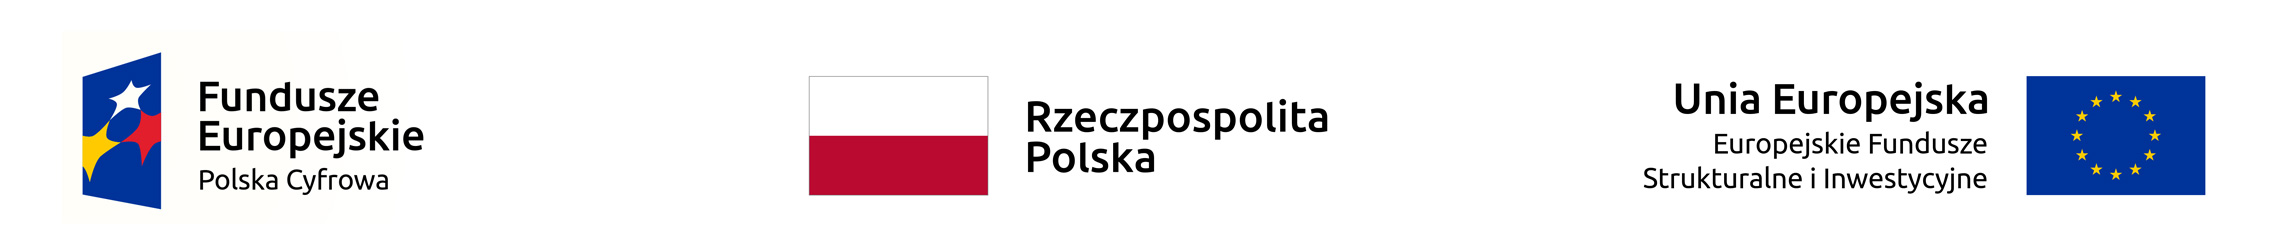 Projekt jest finansowany z programu POPC